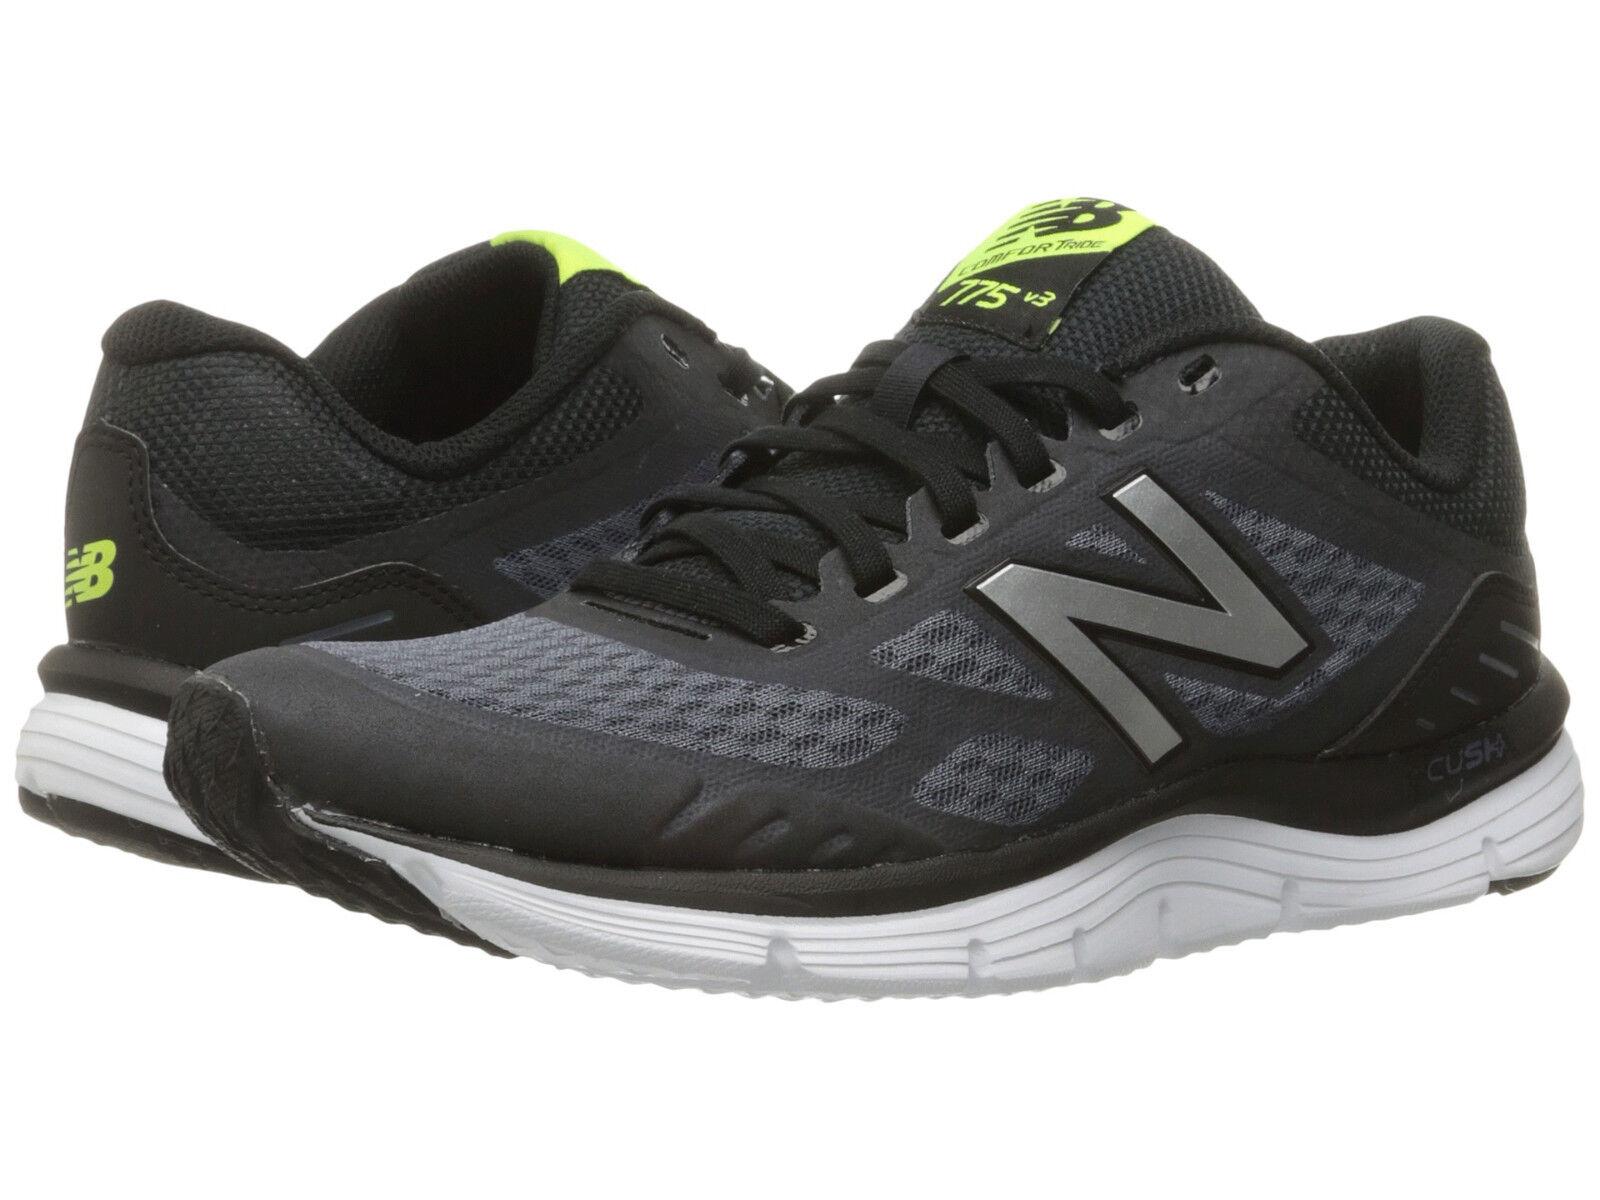 Men New Balance M775LT3 Running Medium (D) Thunder Black 100% Authentic New